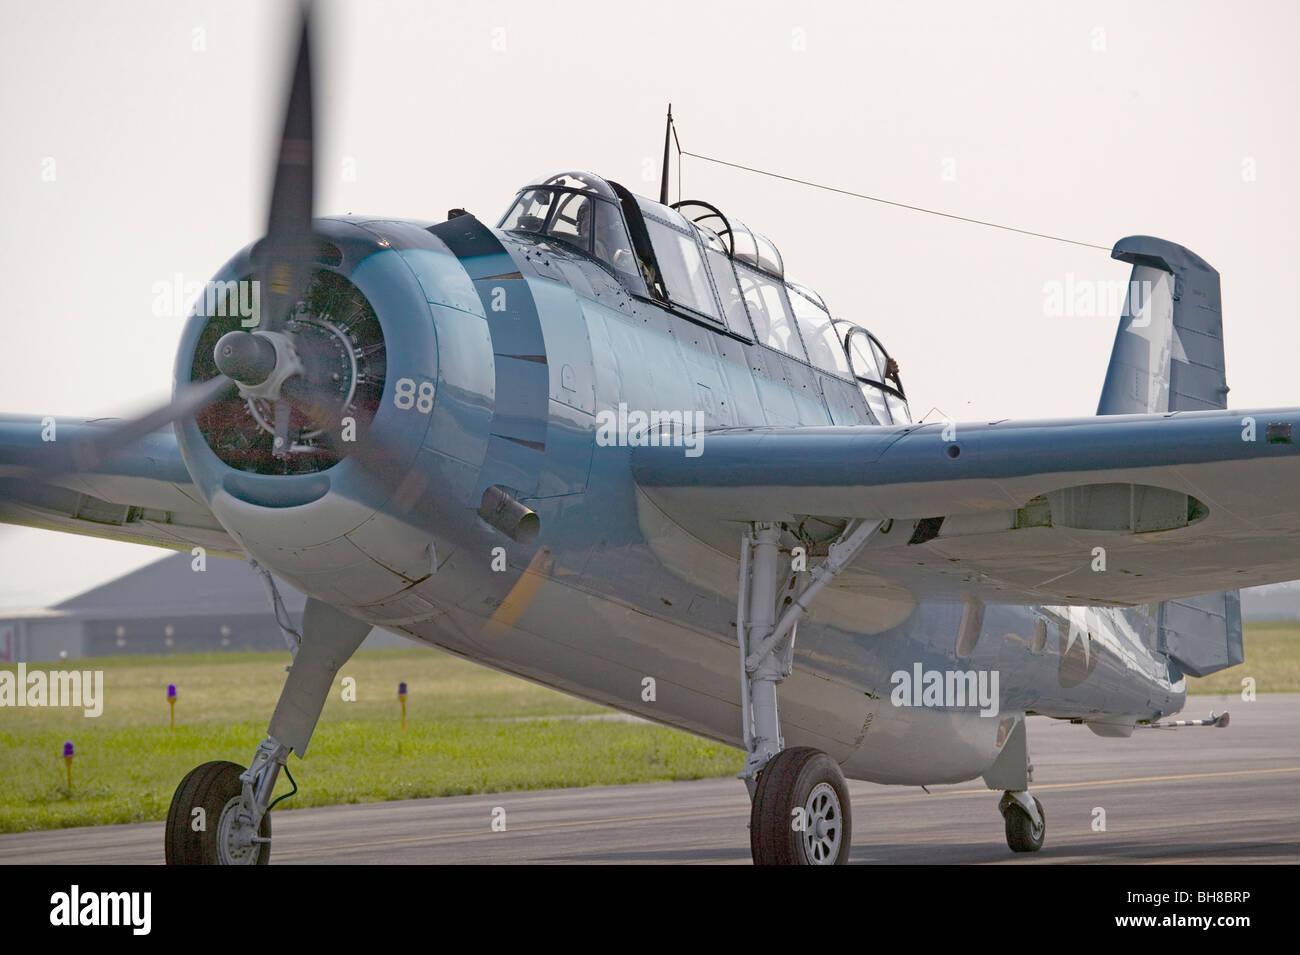 Mid-Atlantic Air Museum World War II Weekend and Reenactment